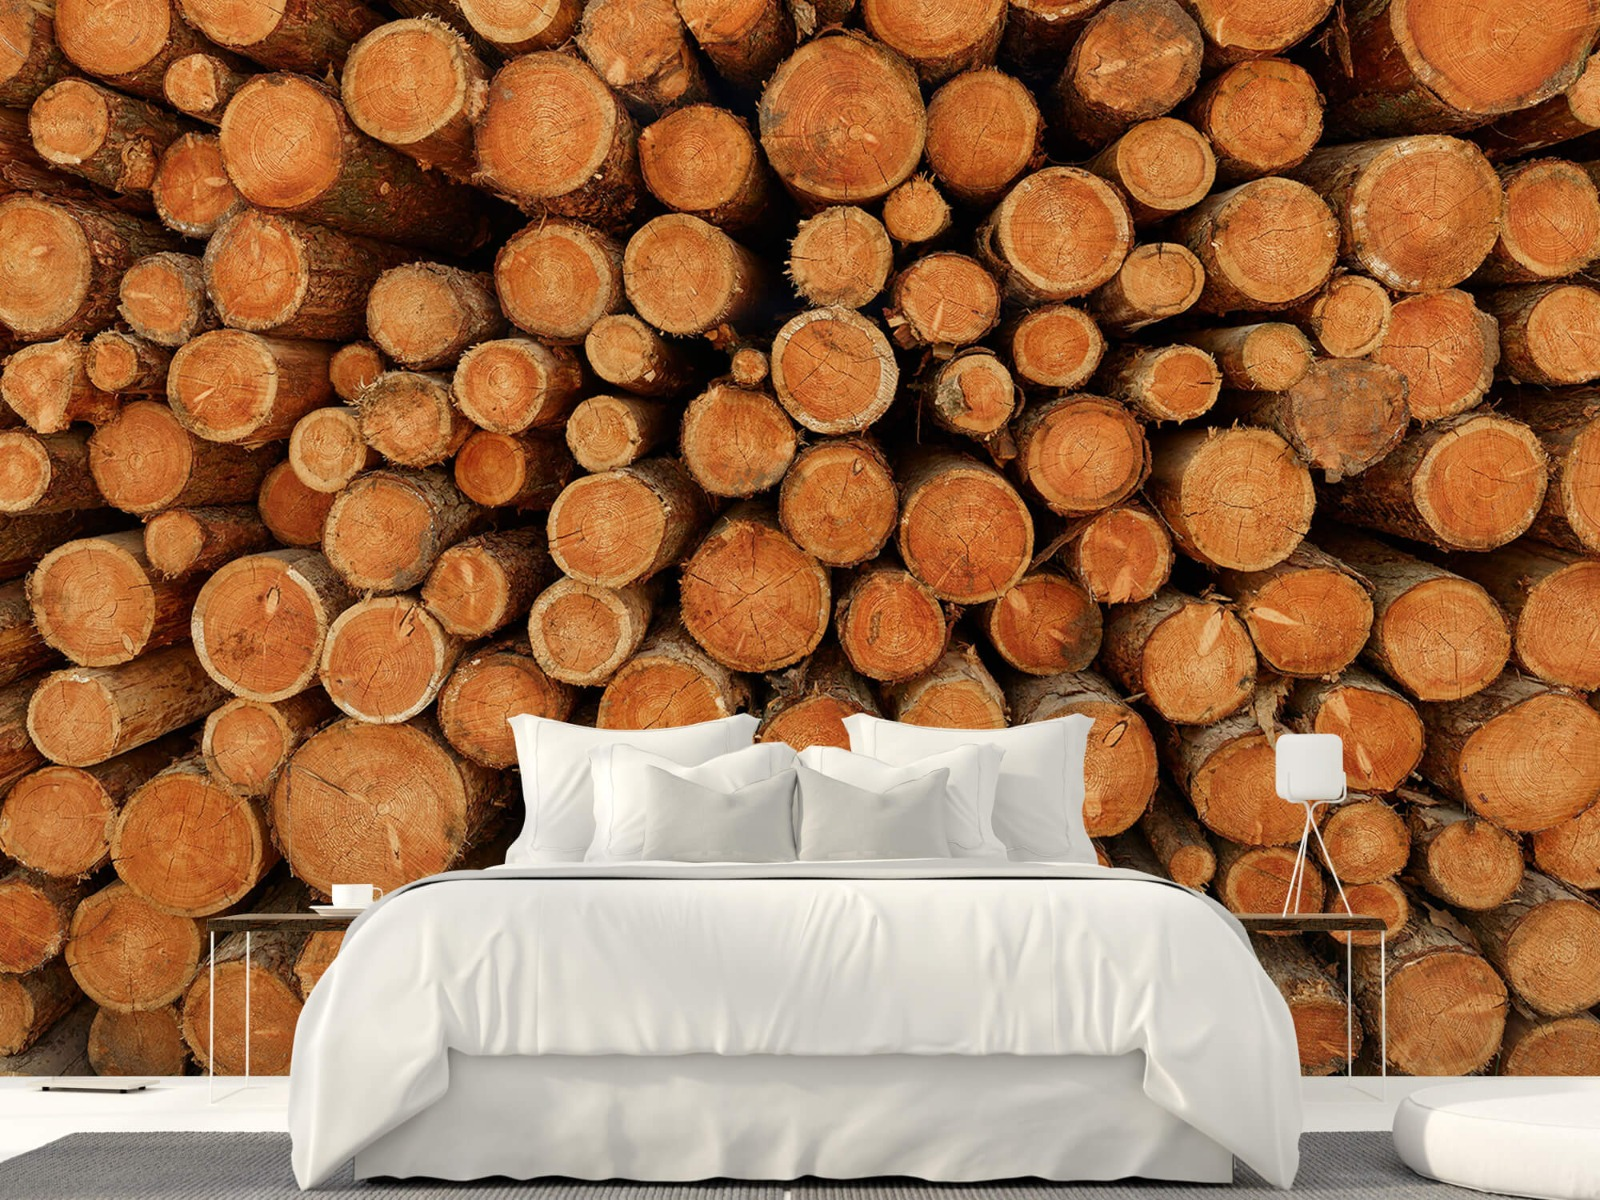 Bomen - Stapel donkere boomstammen - Slaapkamer 23